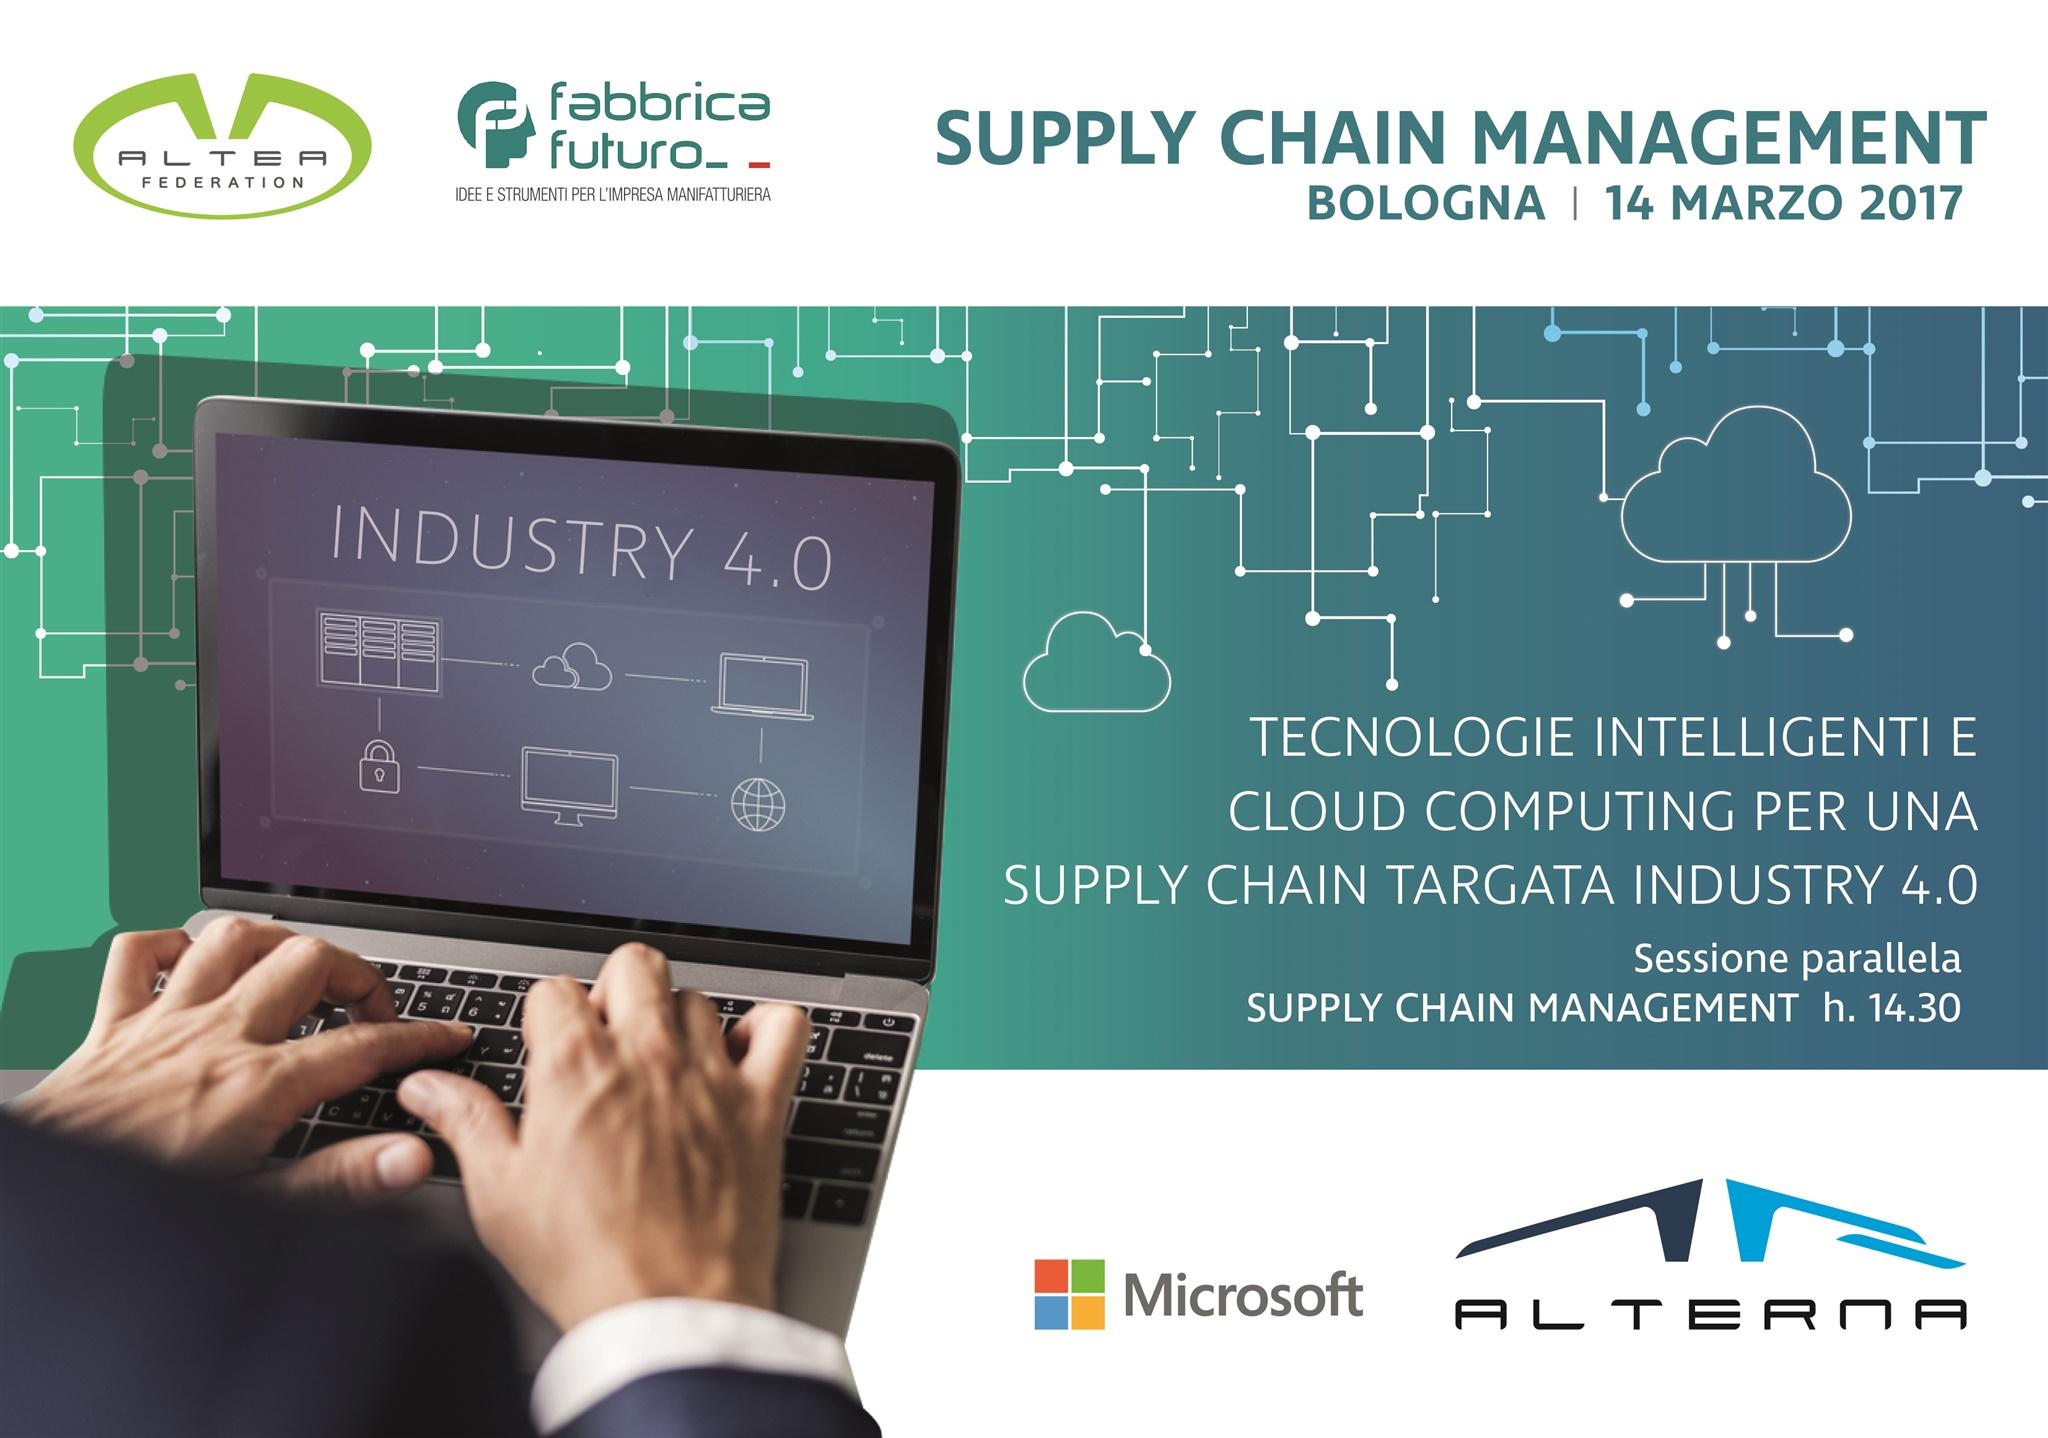 Industry 4.0 Fabbrica Futuro Alterna Microsoft